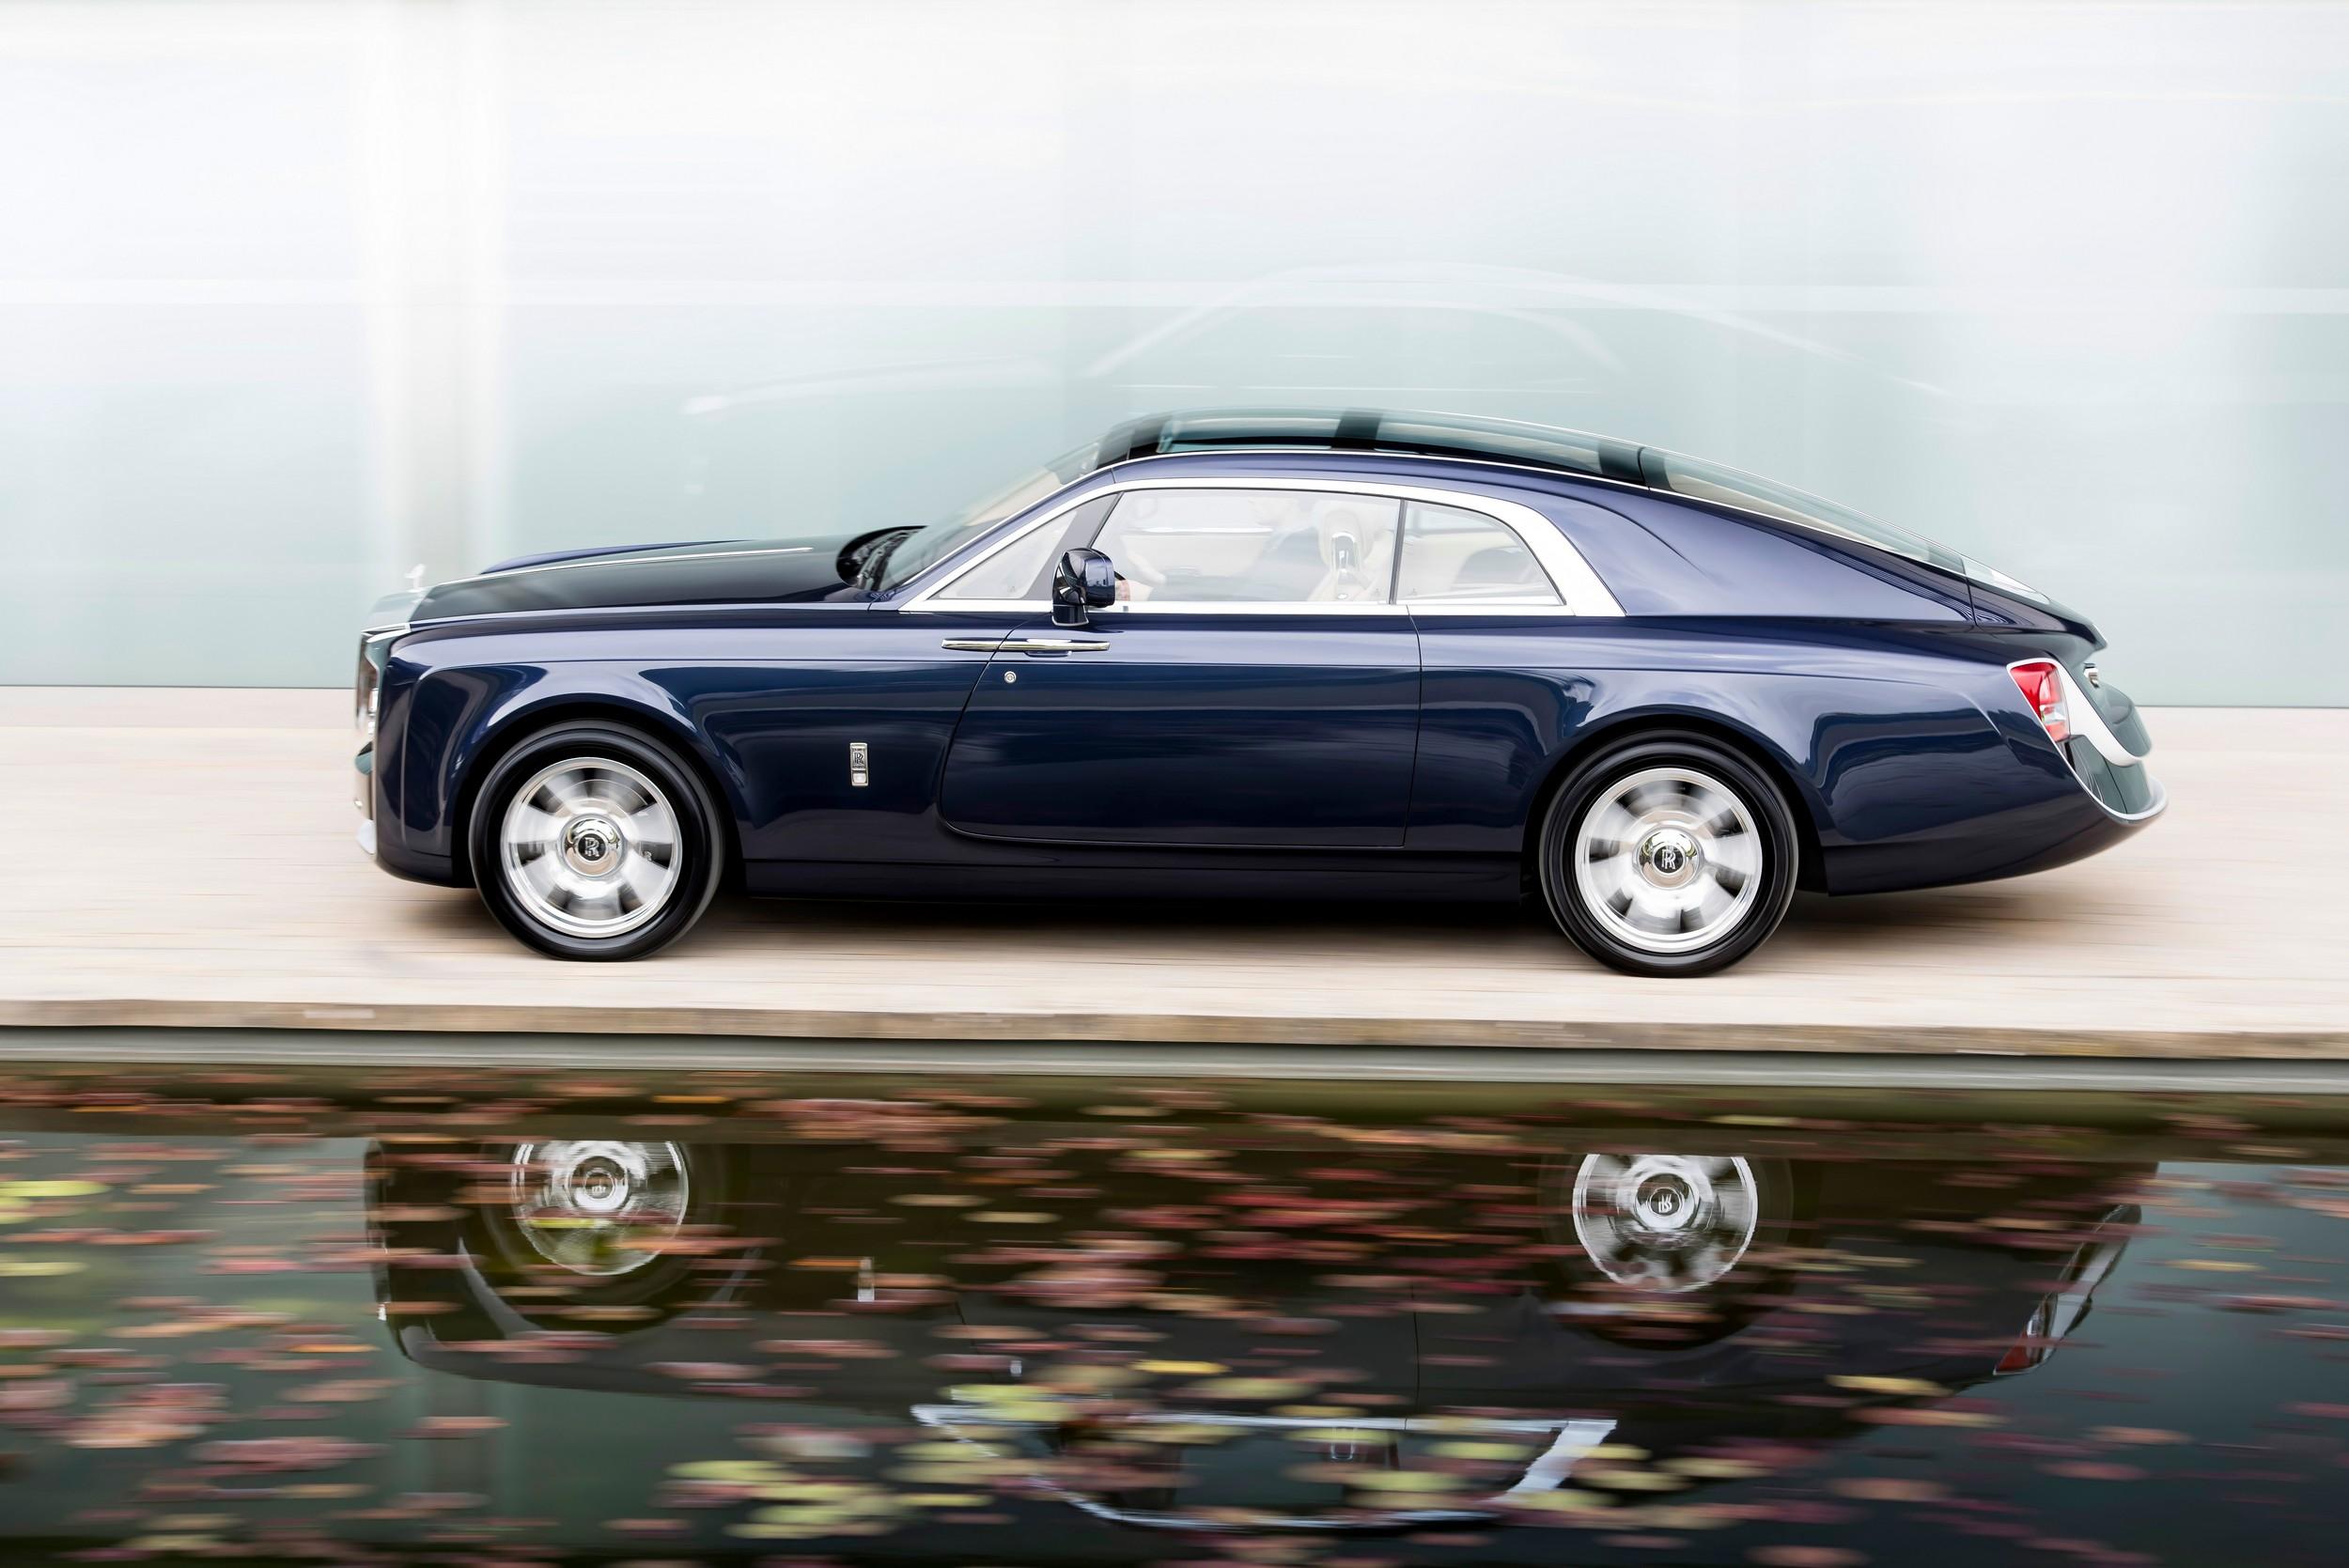 Rolls-Royce coachbuilt Torpedo